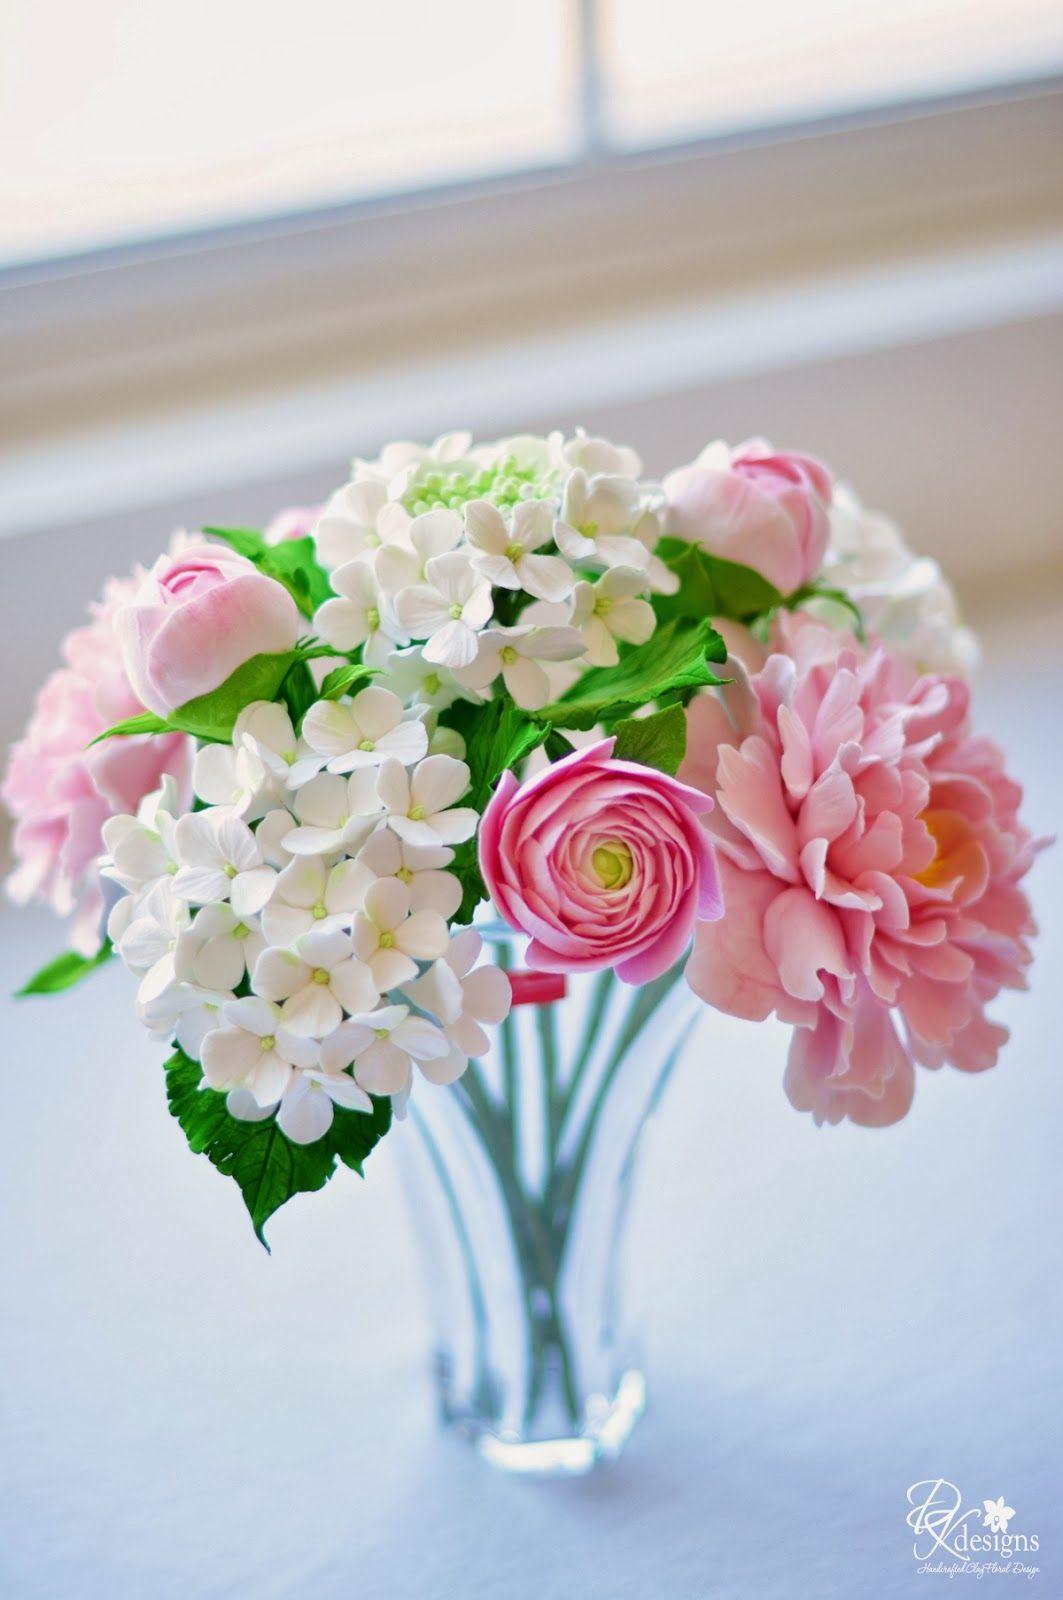 Diseños dk flores pinterest